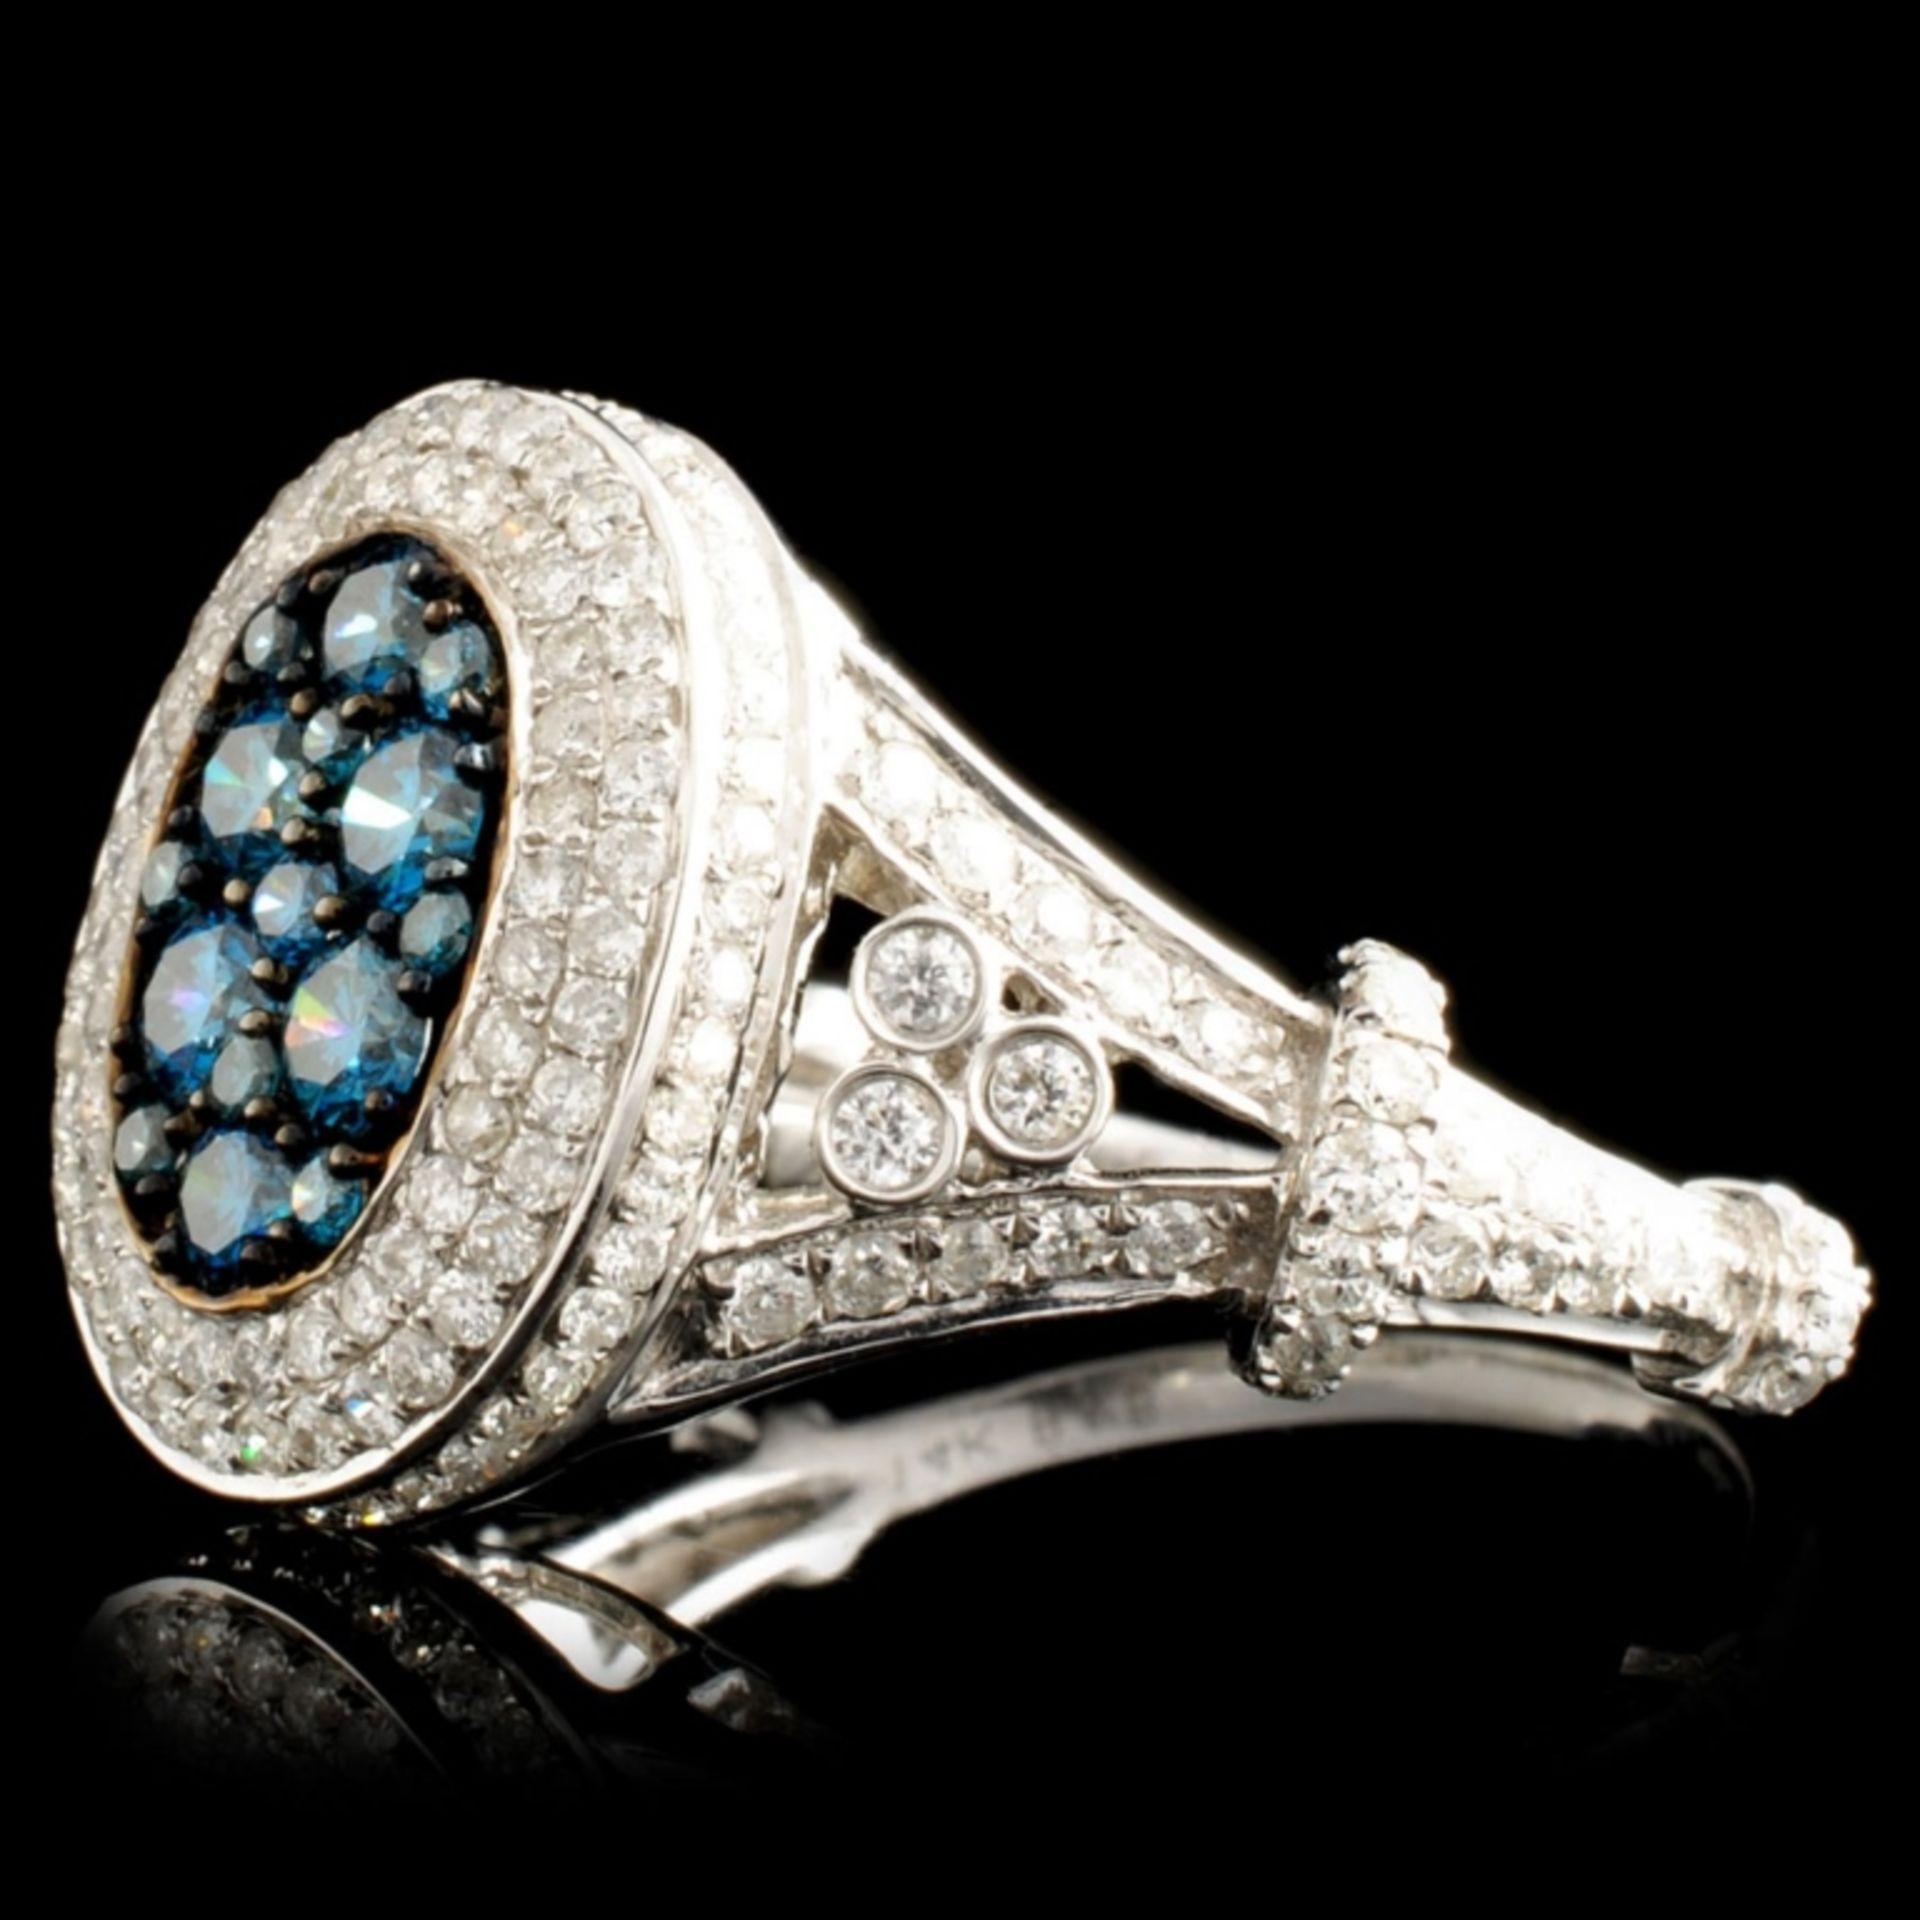 14K Gold 1.20ctw Diamond Ring - Image 2 of 5